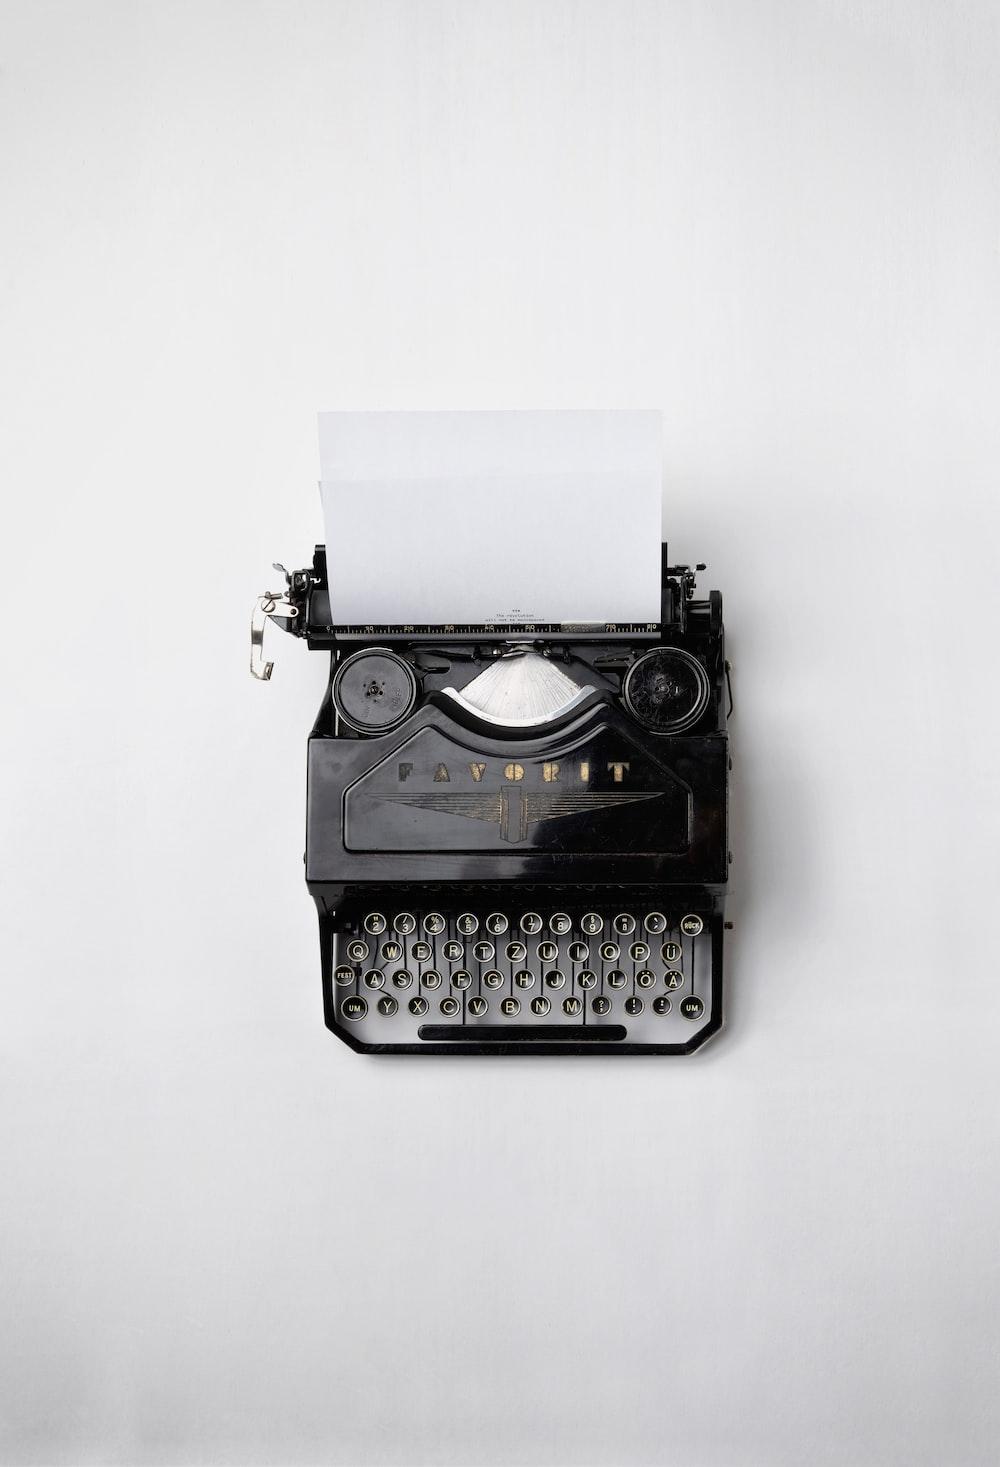 LJIZlzHgQ7WPSh5KVTCB Typewriter.jpg?ixlib=rb 1.2